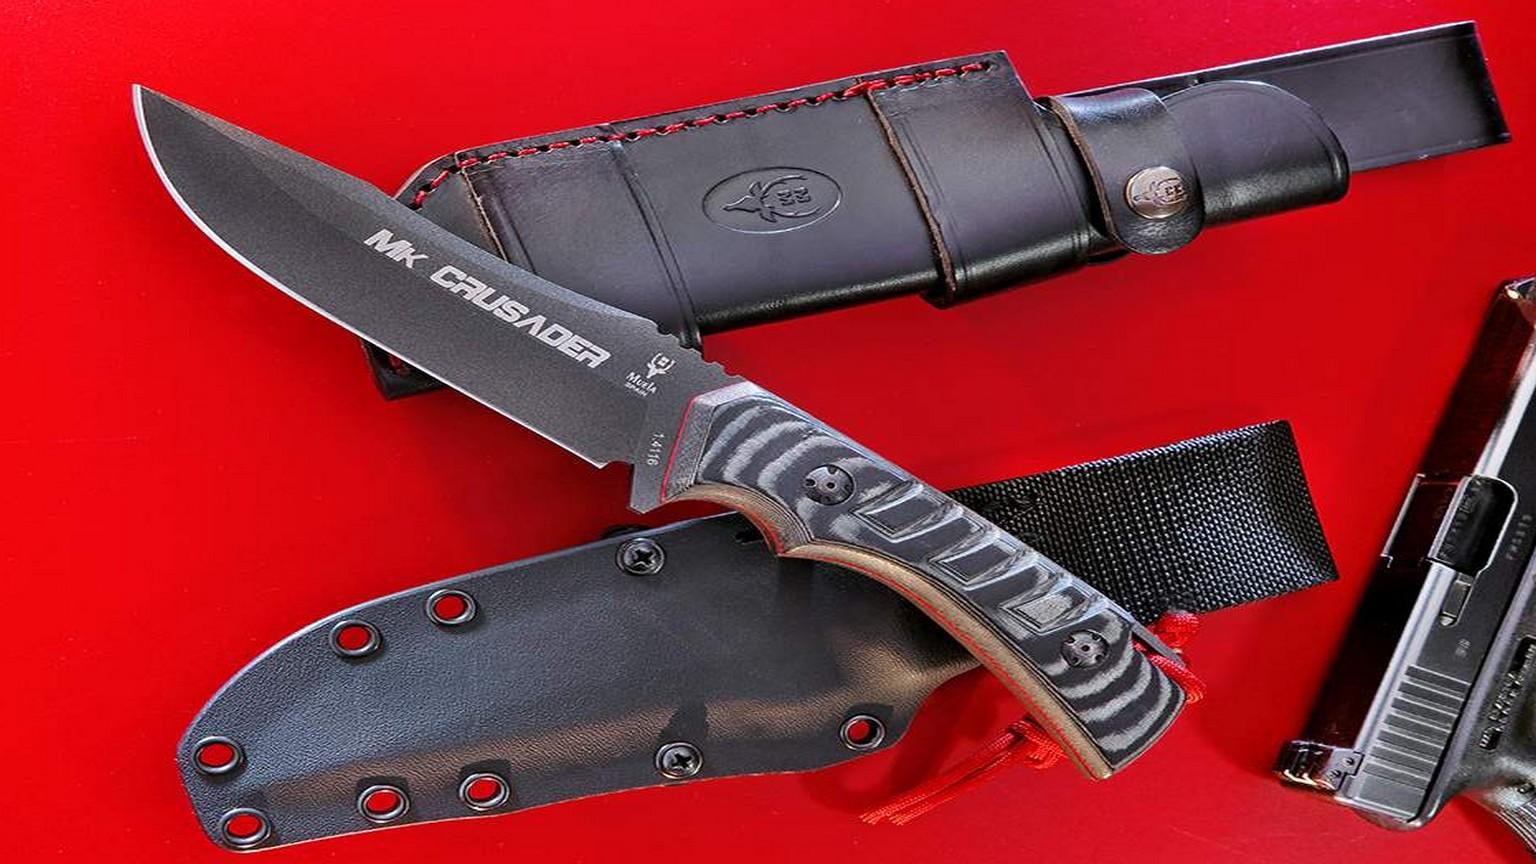 Cuchillo Crusader-13M.N Pavonado